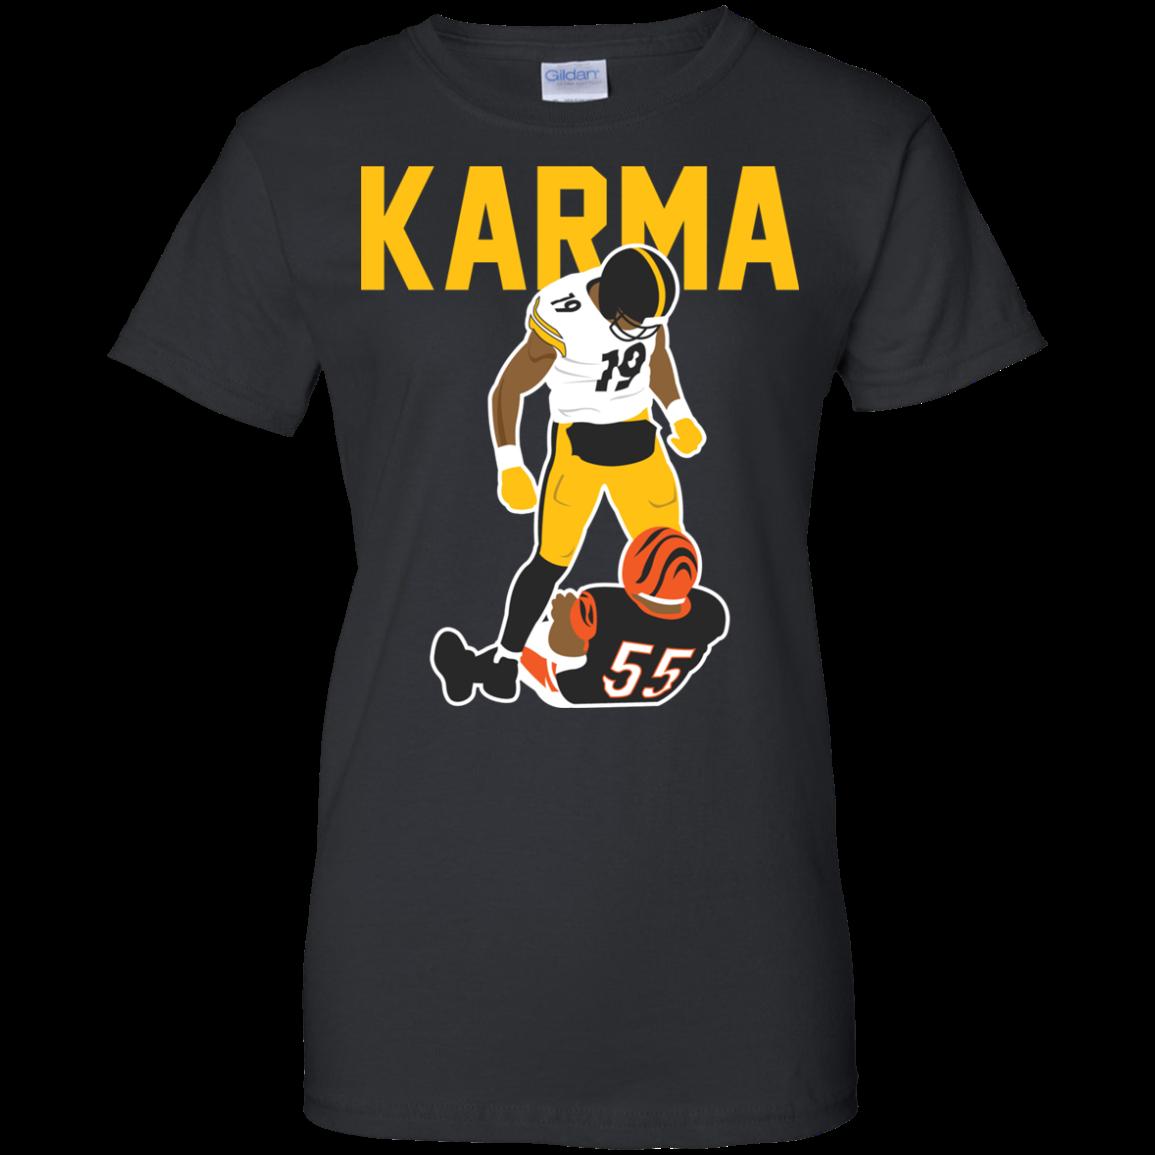 on sale f5150 c89e1 Steelers Karma JuJu Smith-Schuster Vontaze Burfict T-shirt